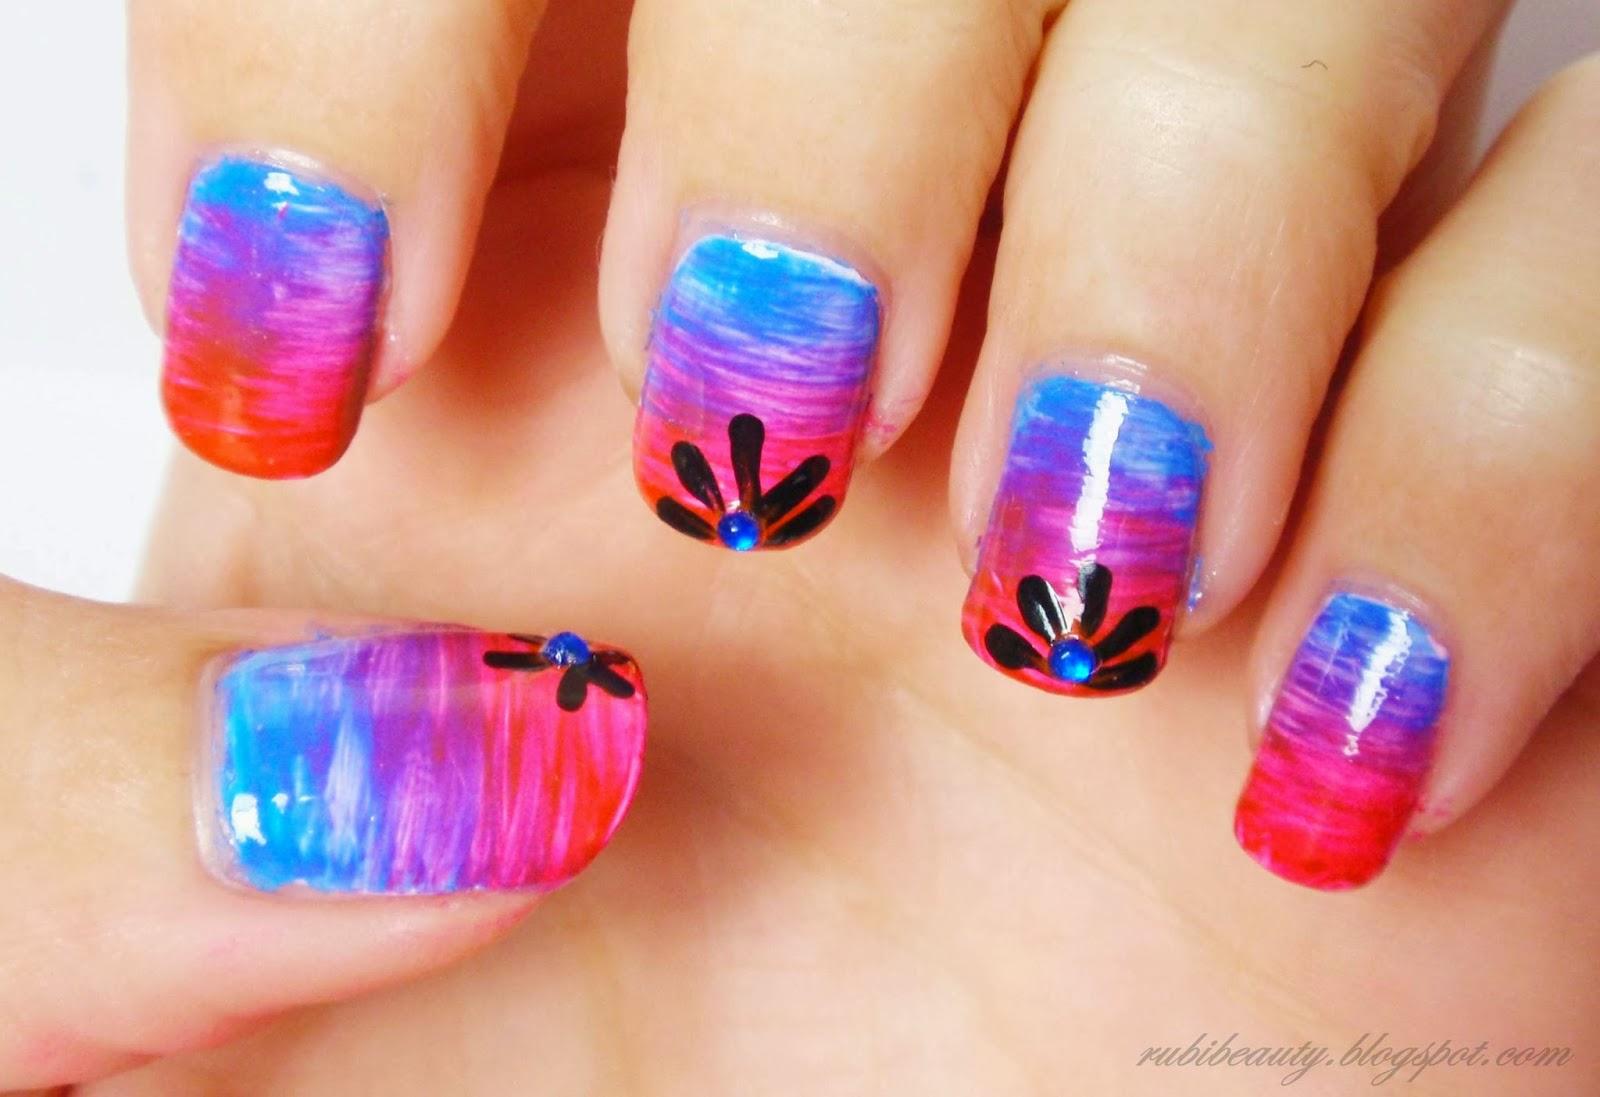 rubibeauty nail art diseño uñas sencillo pintura acrilica degradado free hand